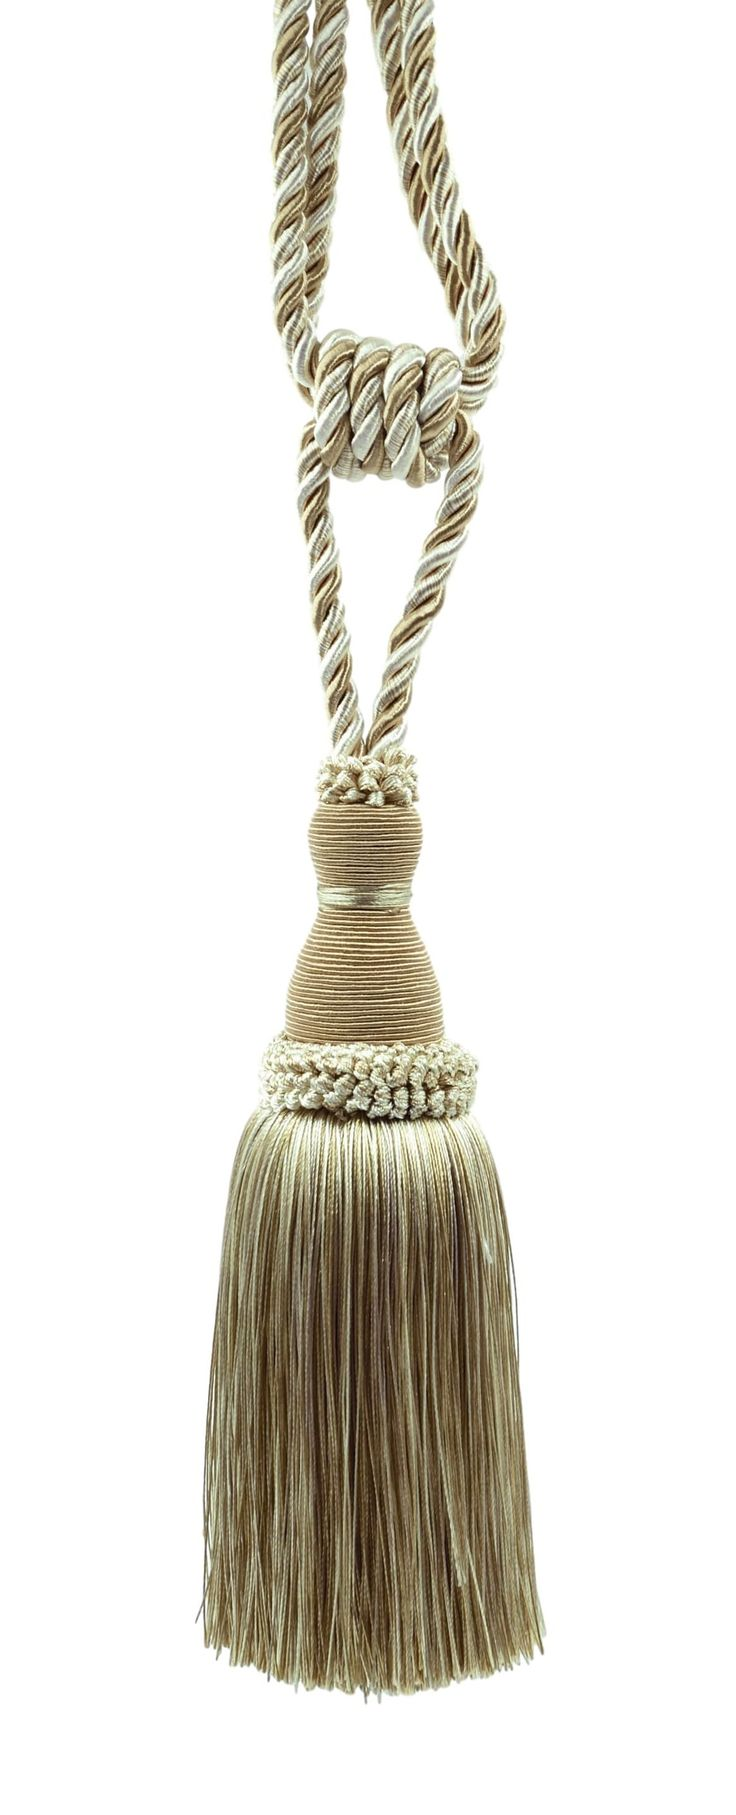 Elegant Ivory, Light Beige Curtain & Drapery Tassel Tieback / 8 Inch tassel, 30 Inch Spread (embrace) Style# TBH8 - White Sands 4001